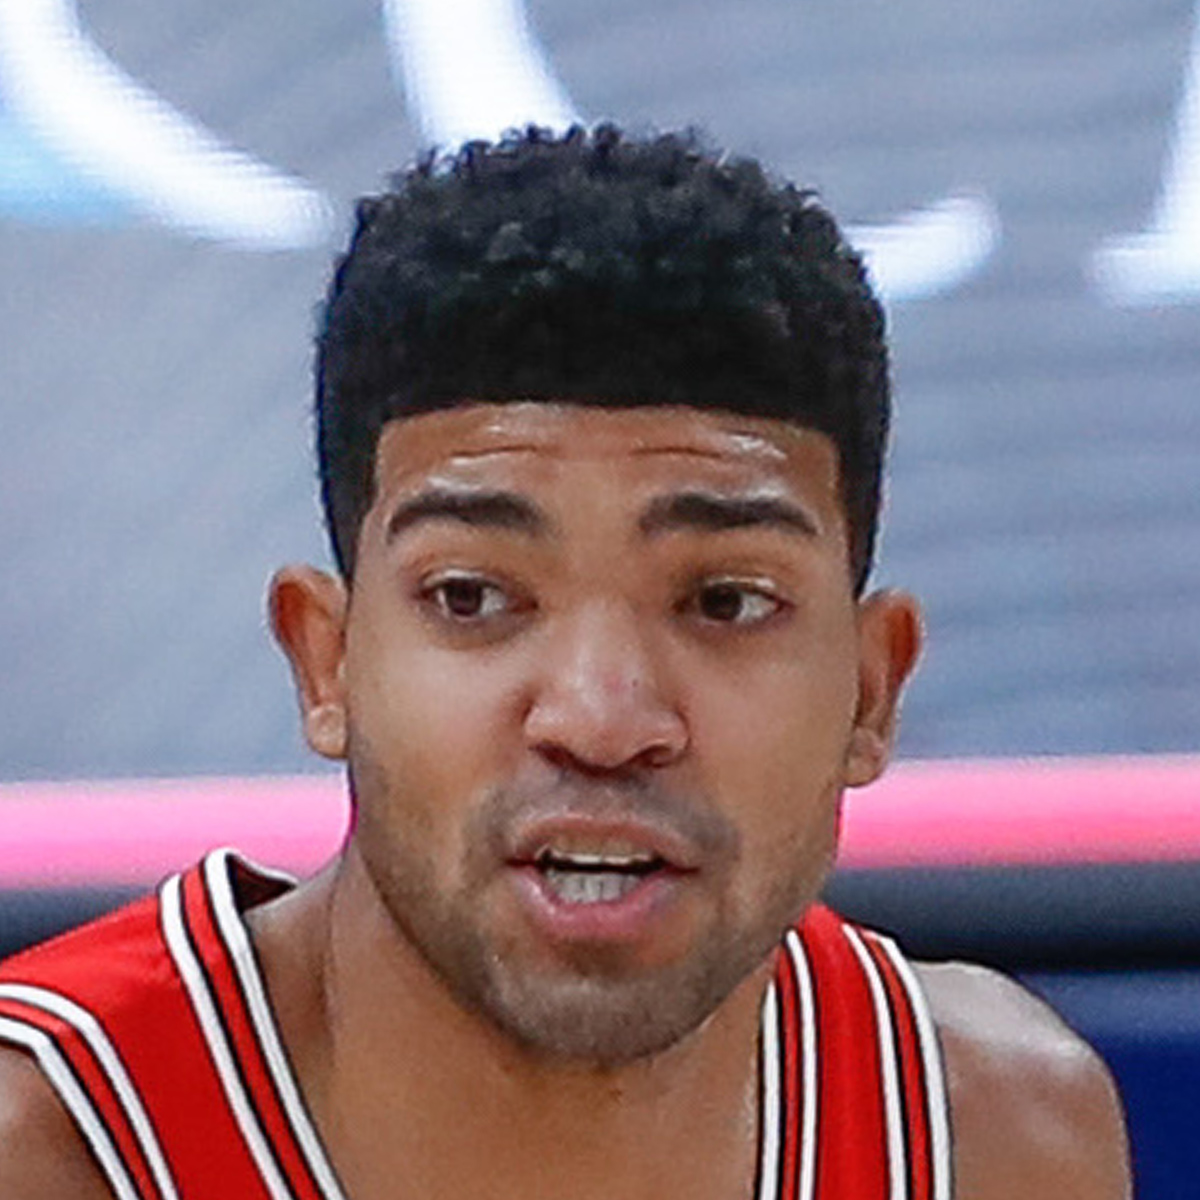 NBA: Player Headshots 2020